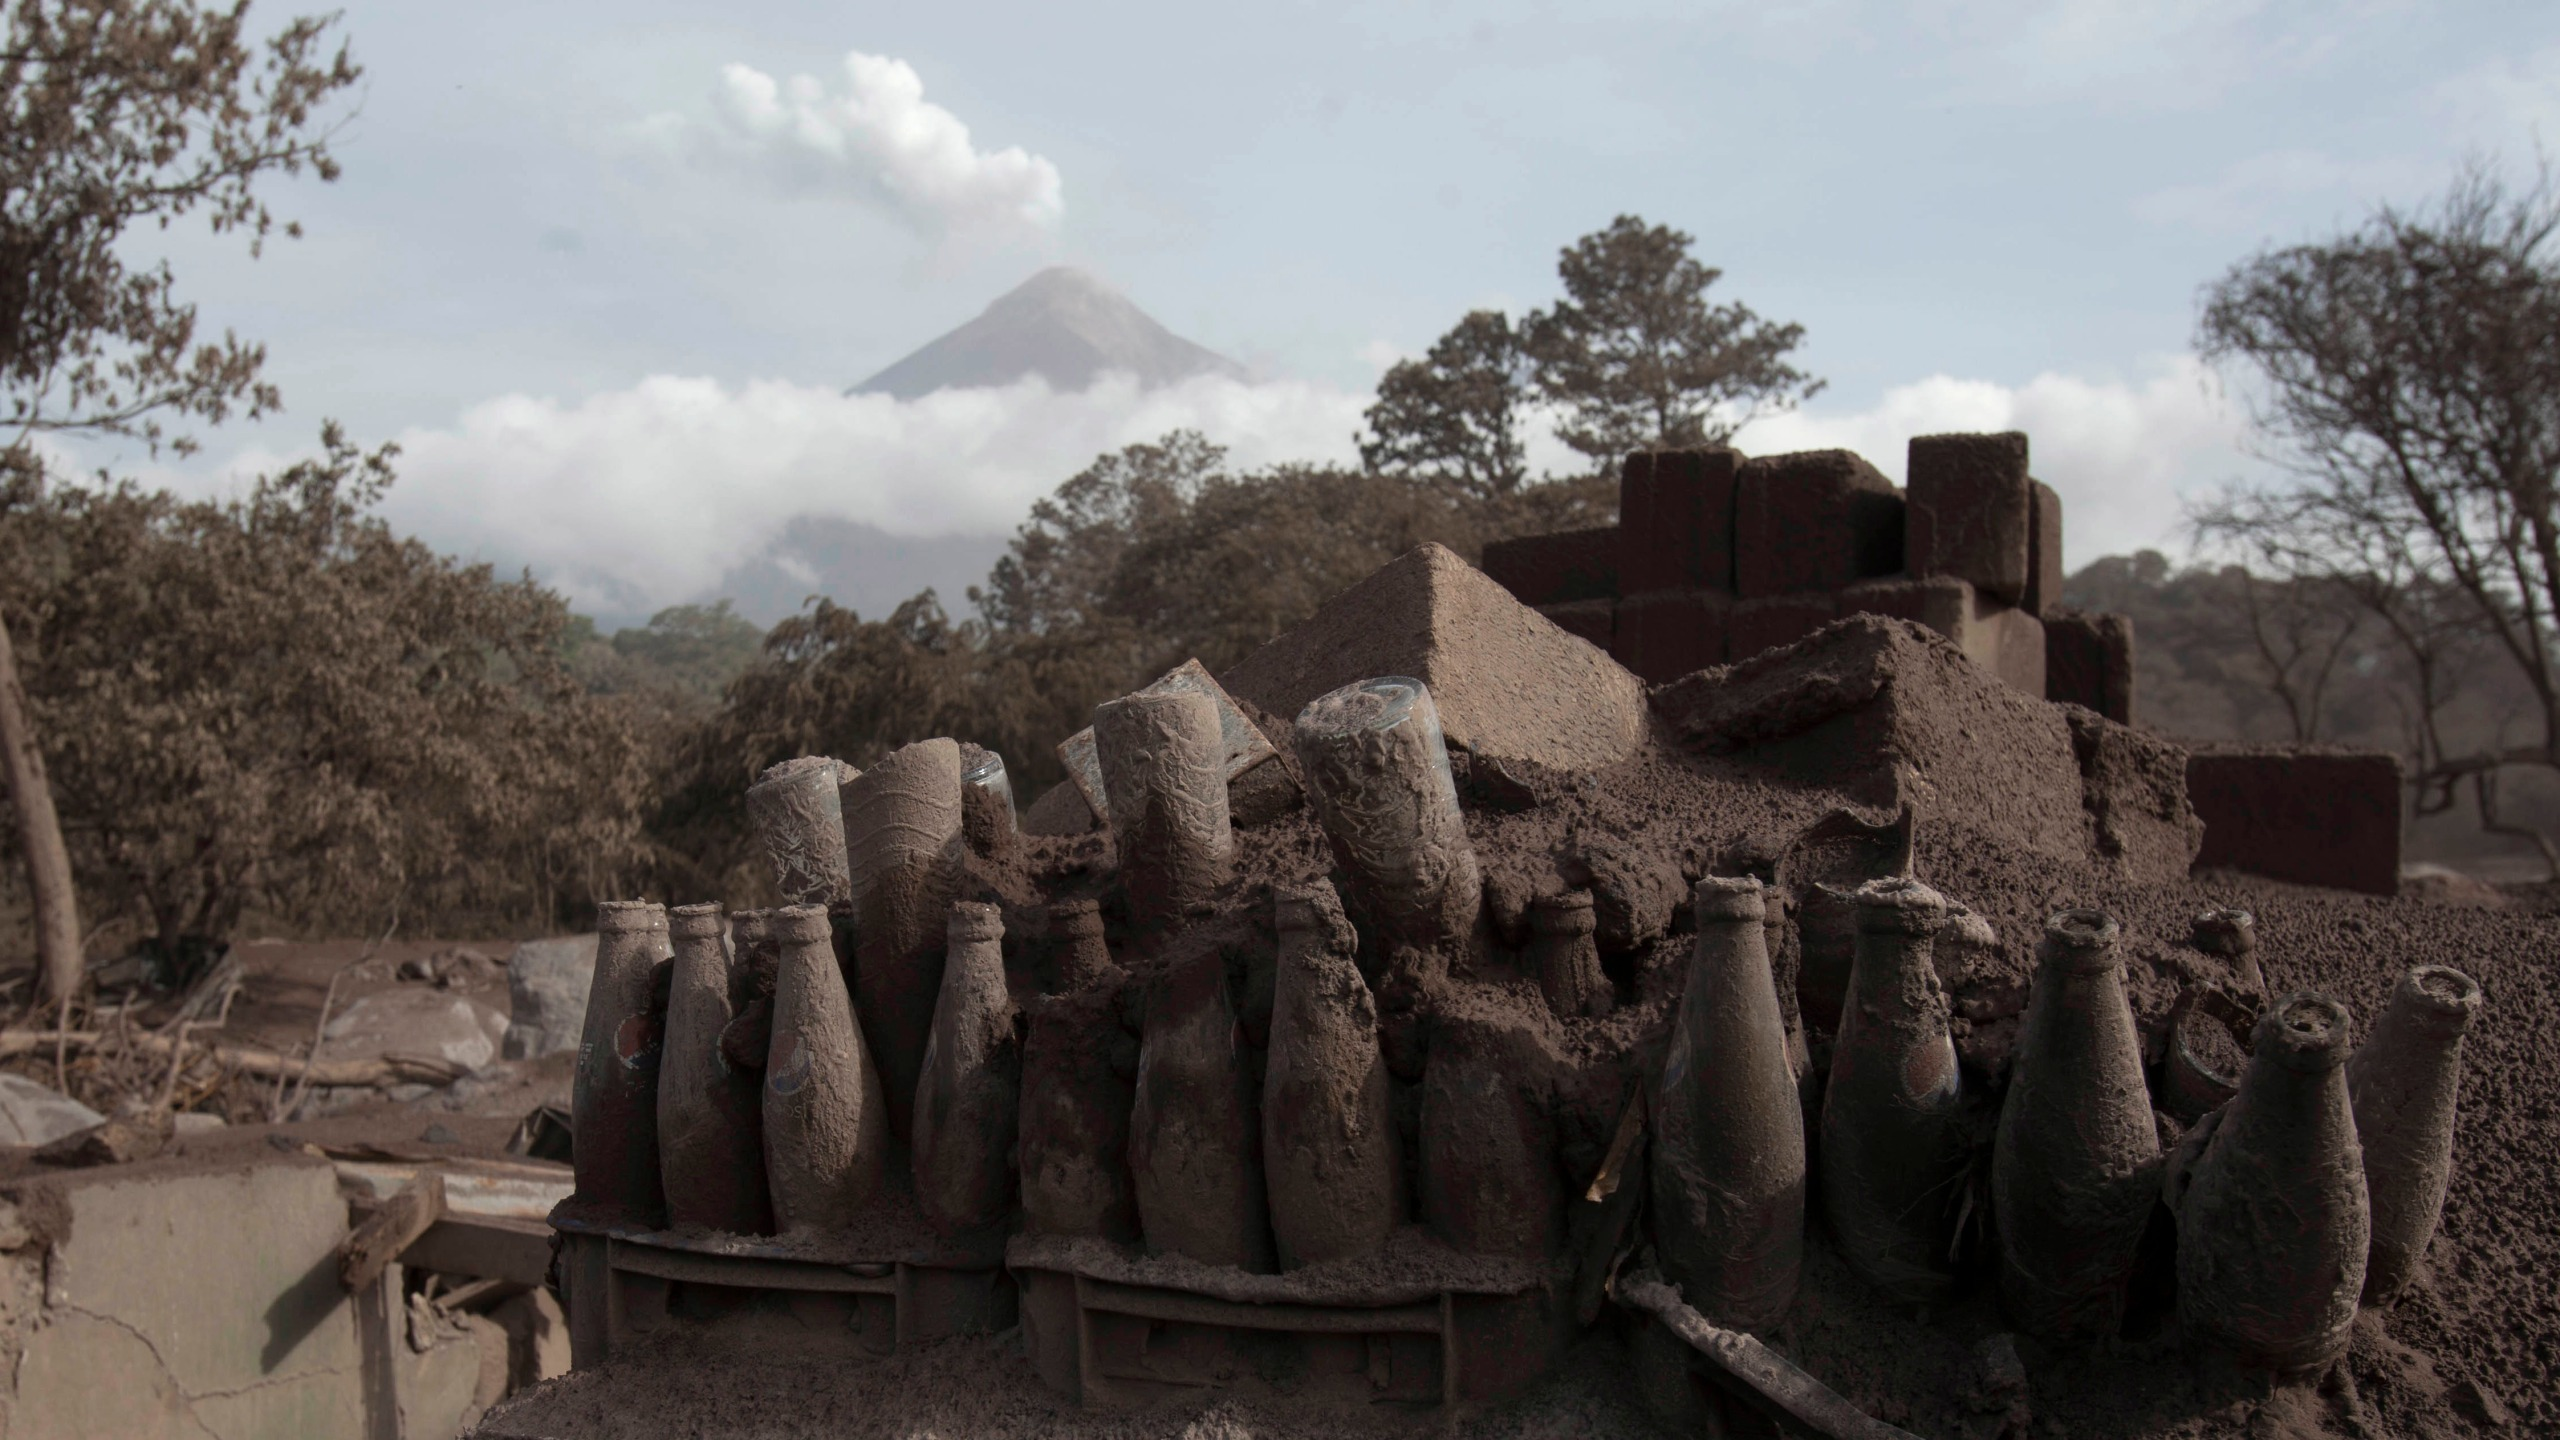 APTOPIX_Guatemala_Volcano_58995-159532.jpg60608897